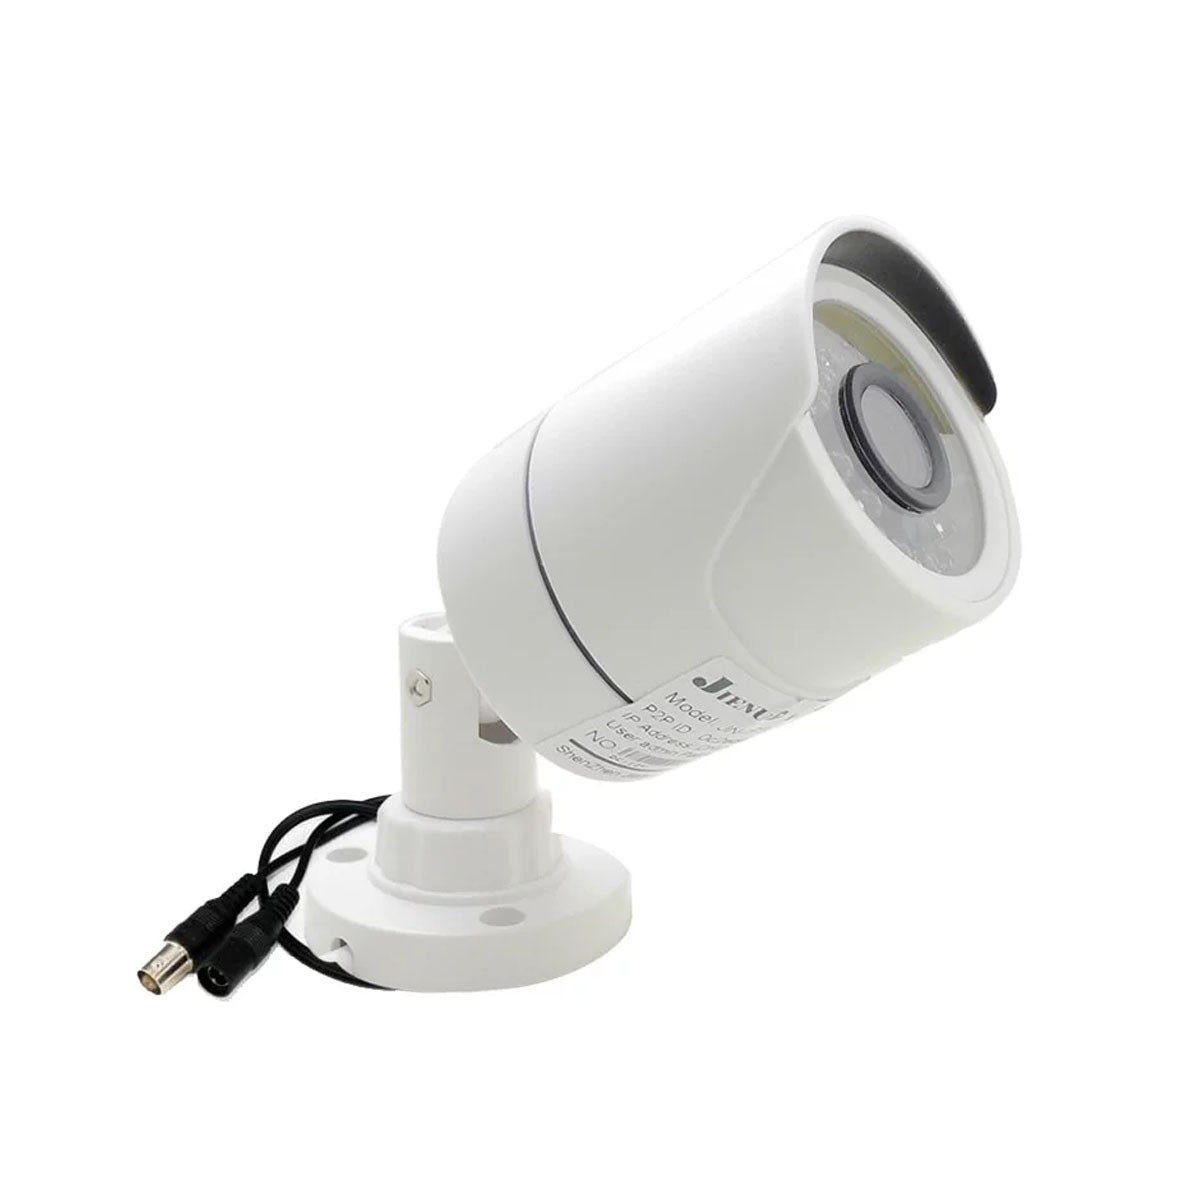 Kit 3 Cameras Infra Hd 1.3mp Externa Acesso App Xmeye